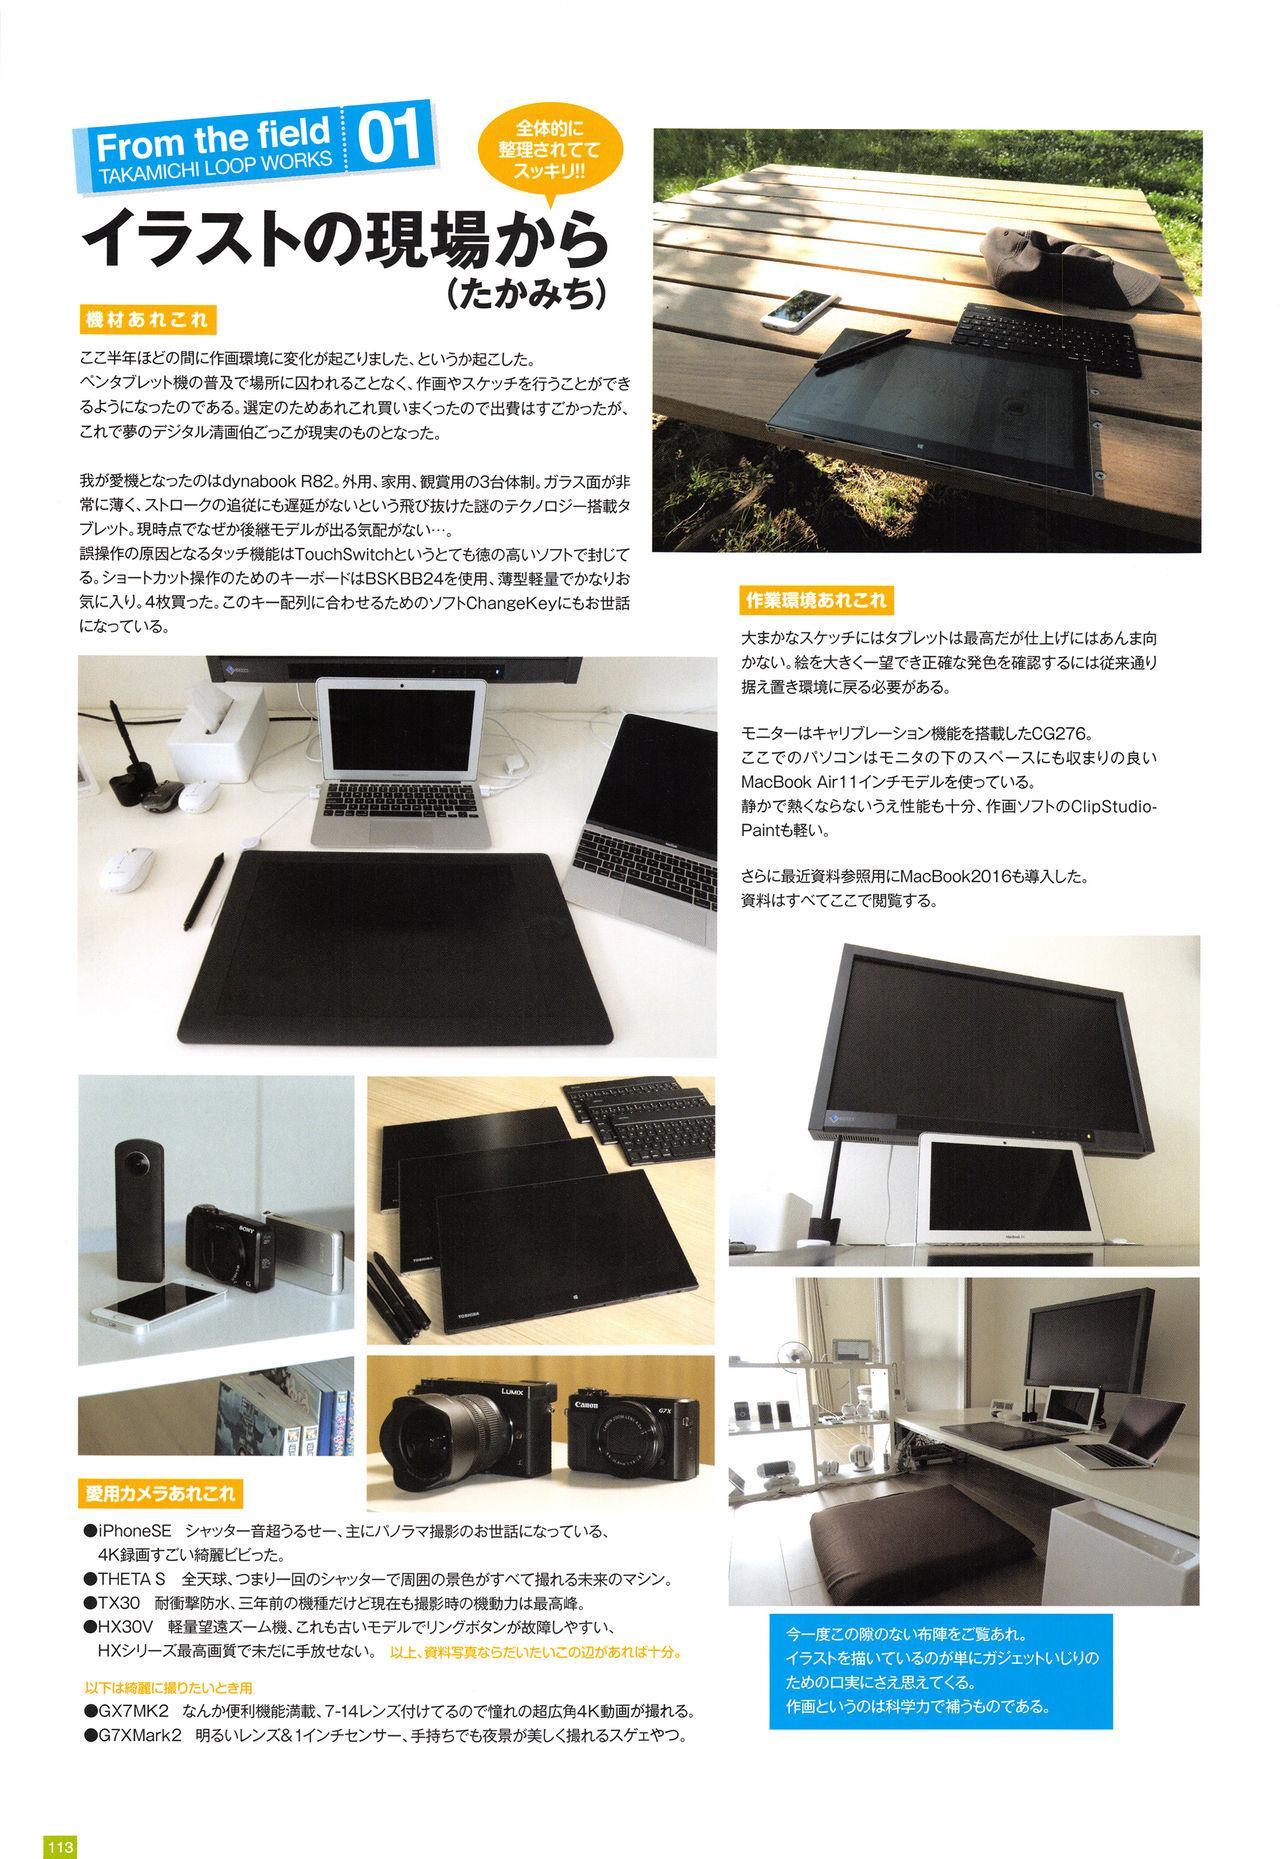 LO Artbook 2-A TAKAMICHI LOOP WORKS 115